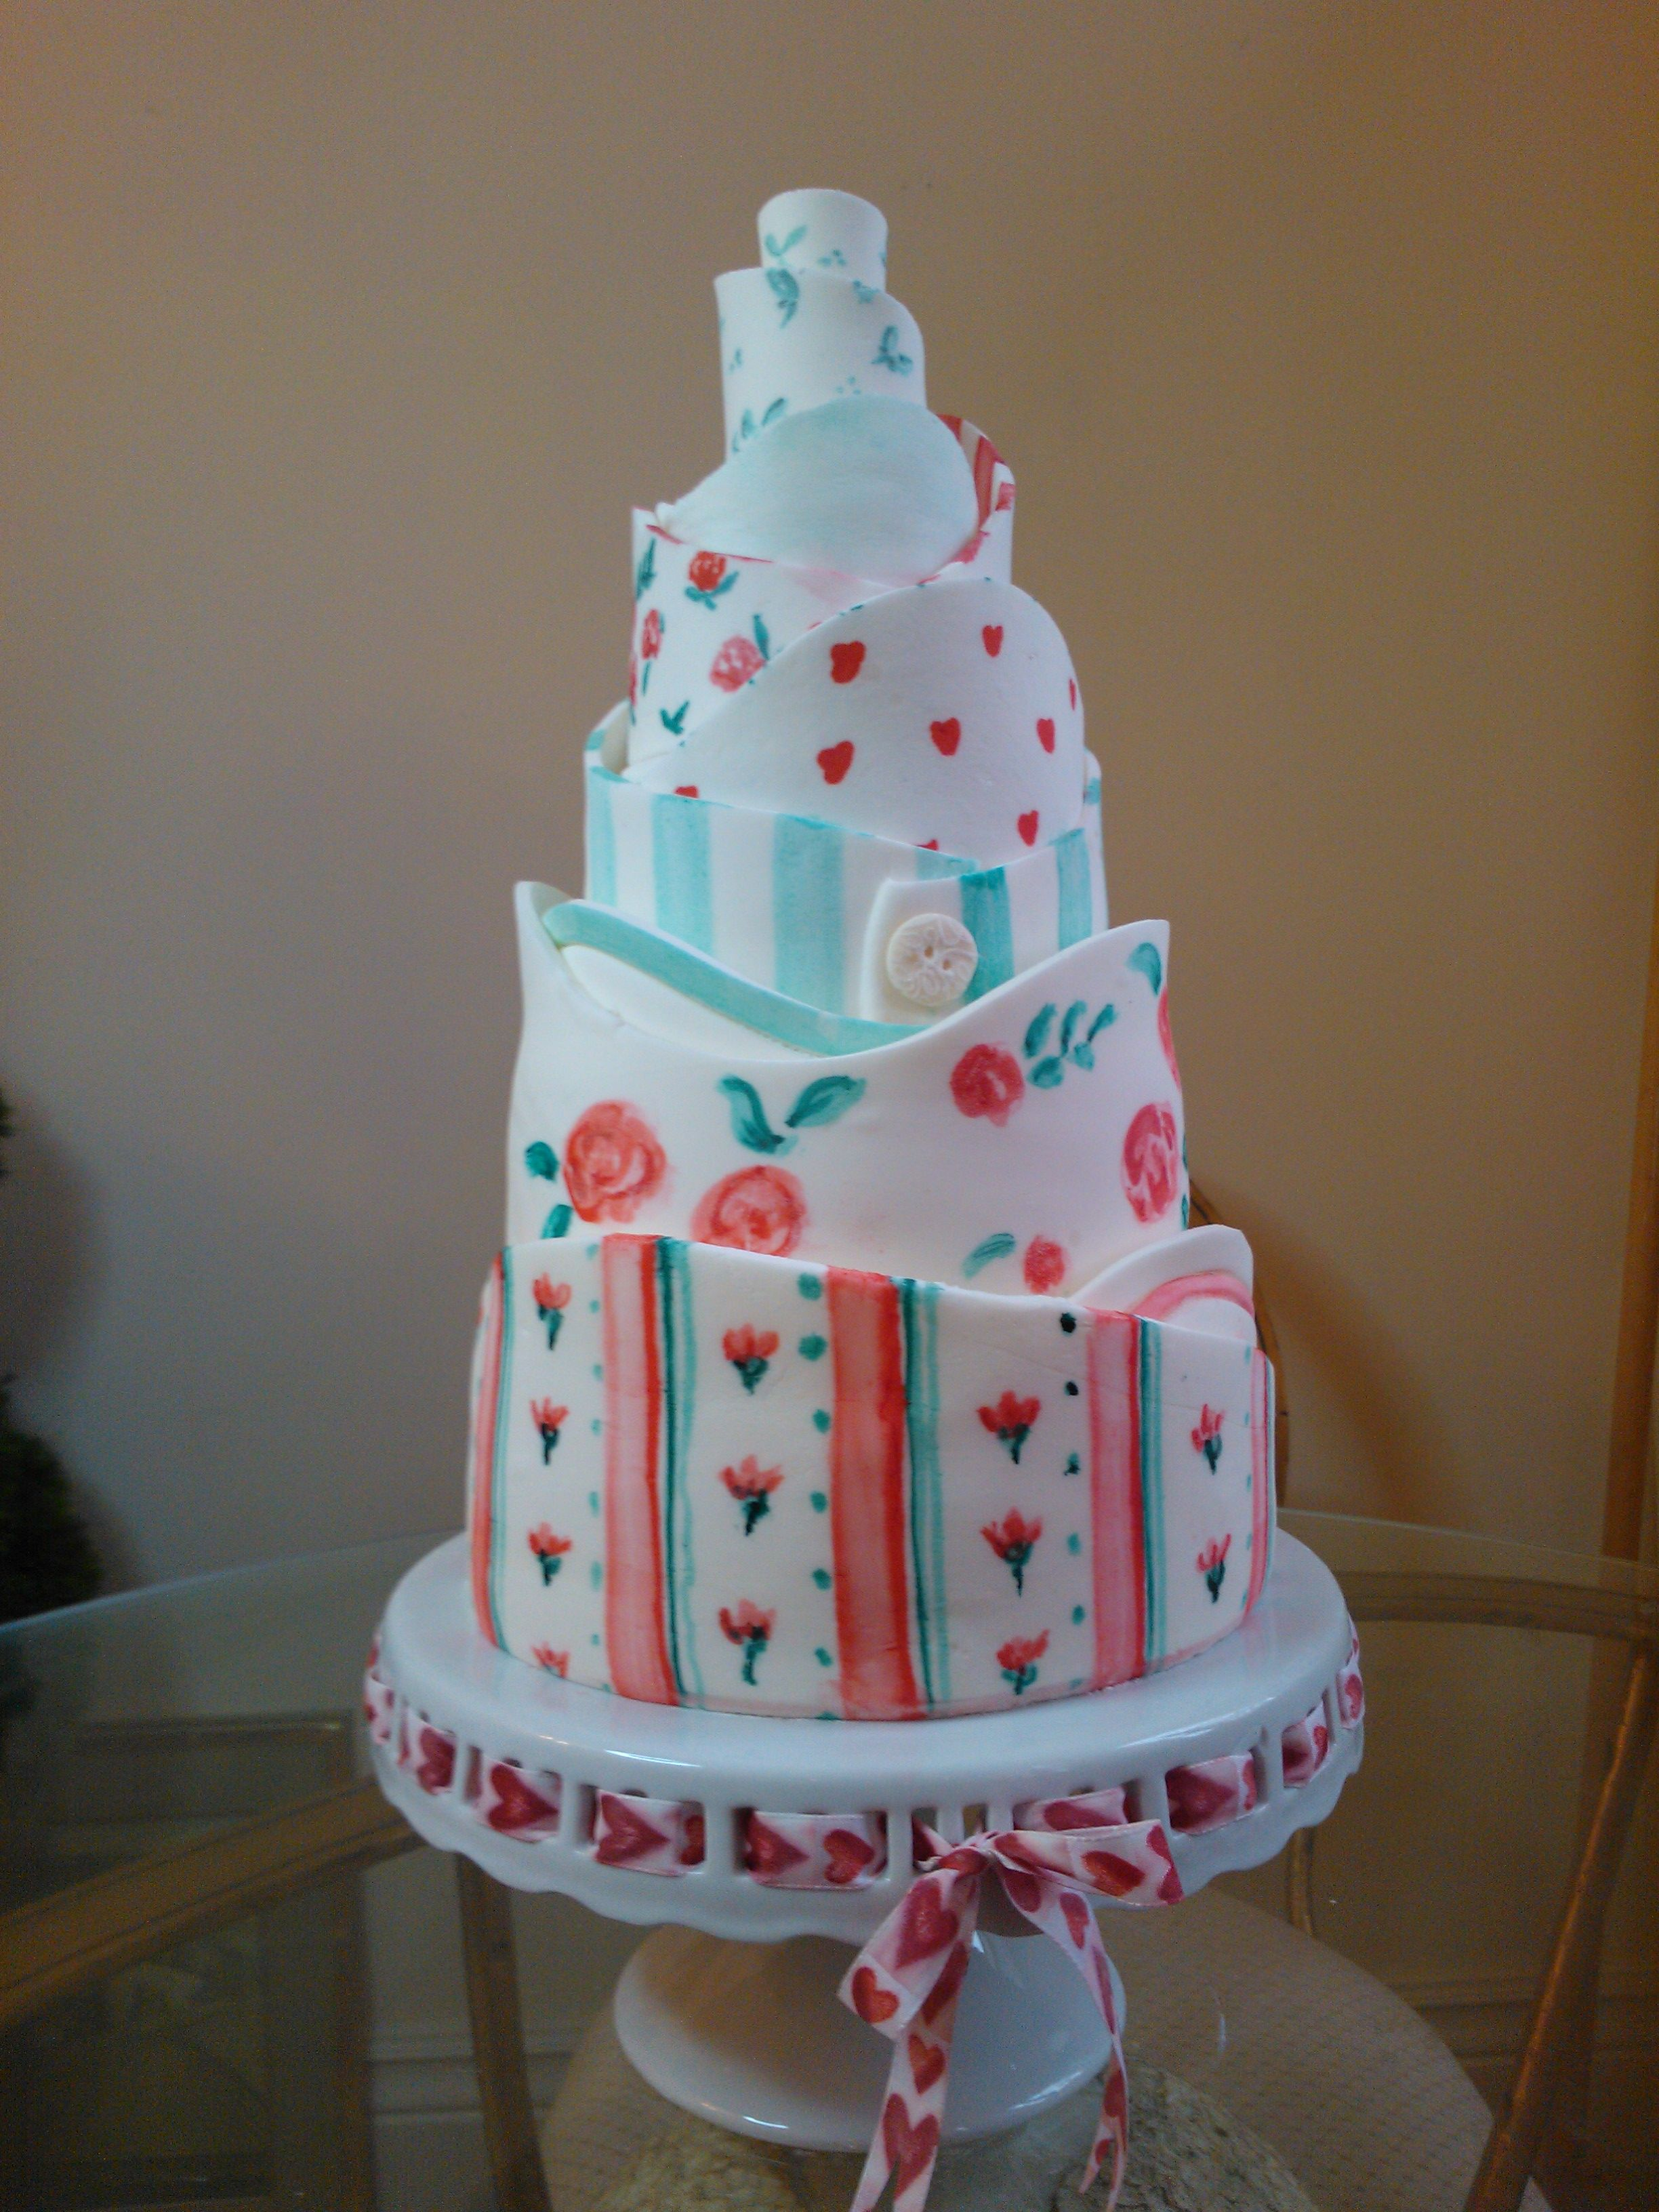 Wedding cake table decoration ideas  Kath Kidson inspired wedding cake  Table Decor u Party Ideas